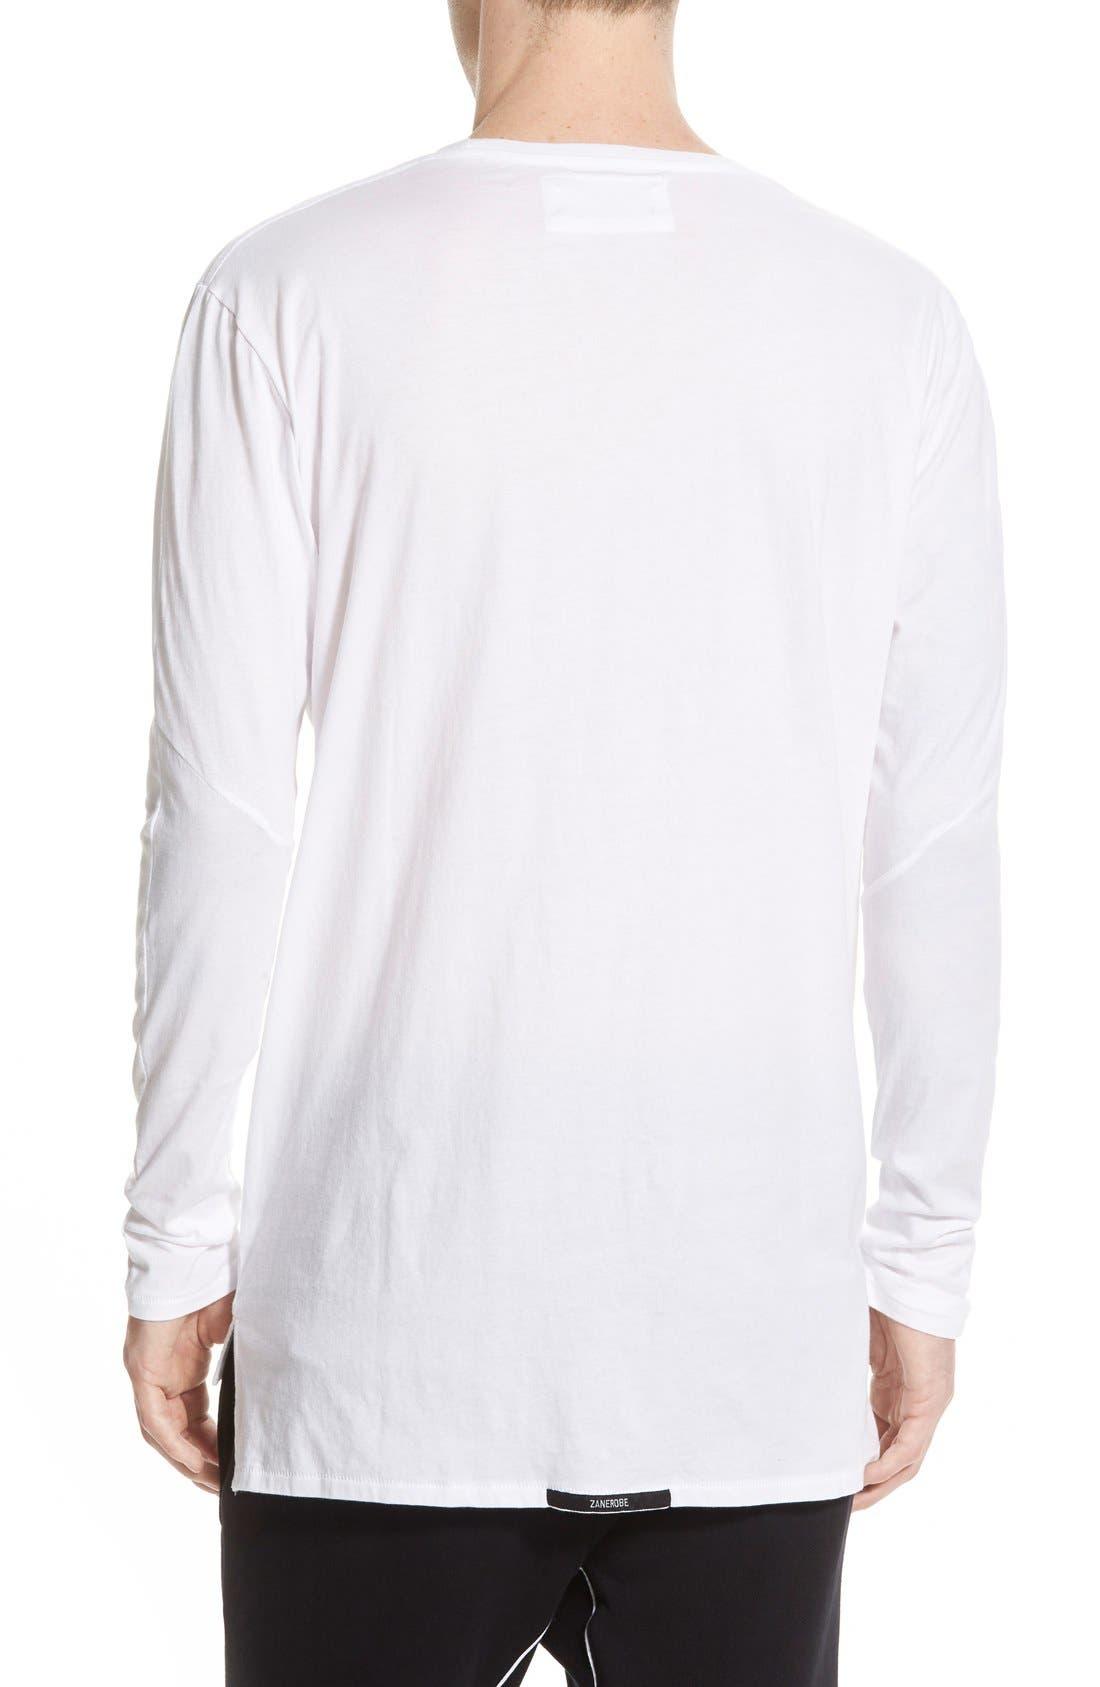 Flintlock Longline Long Sleeve T-Shirt,                             Alternate thumbnail 2, color,                             WHITE